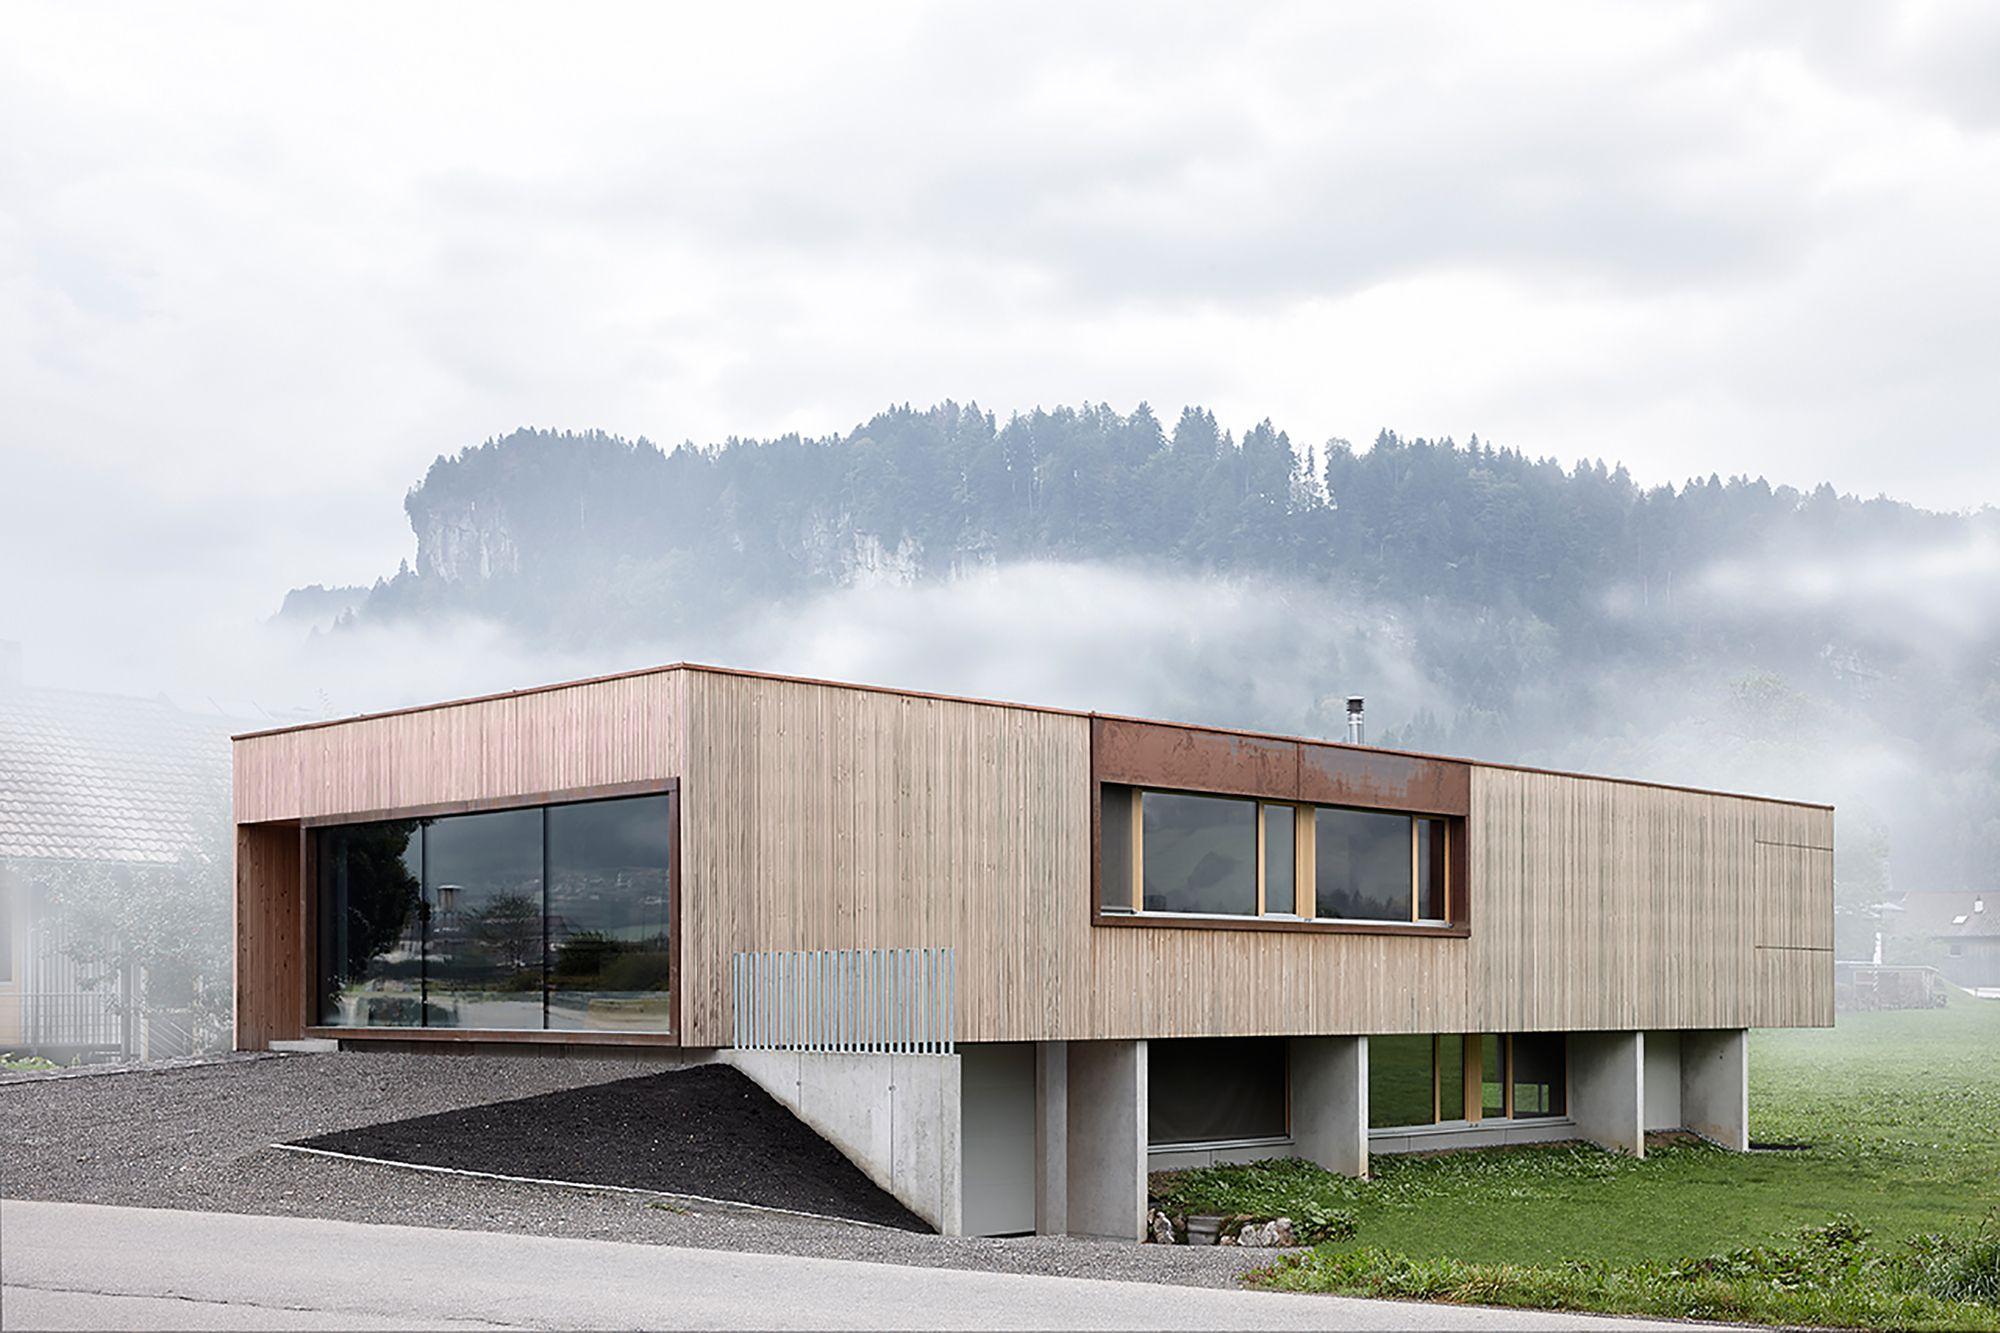 Casa con sala de exposiciones / ao-architekten